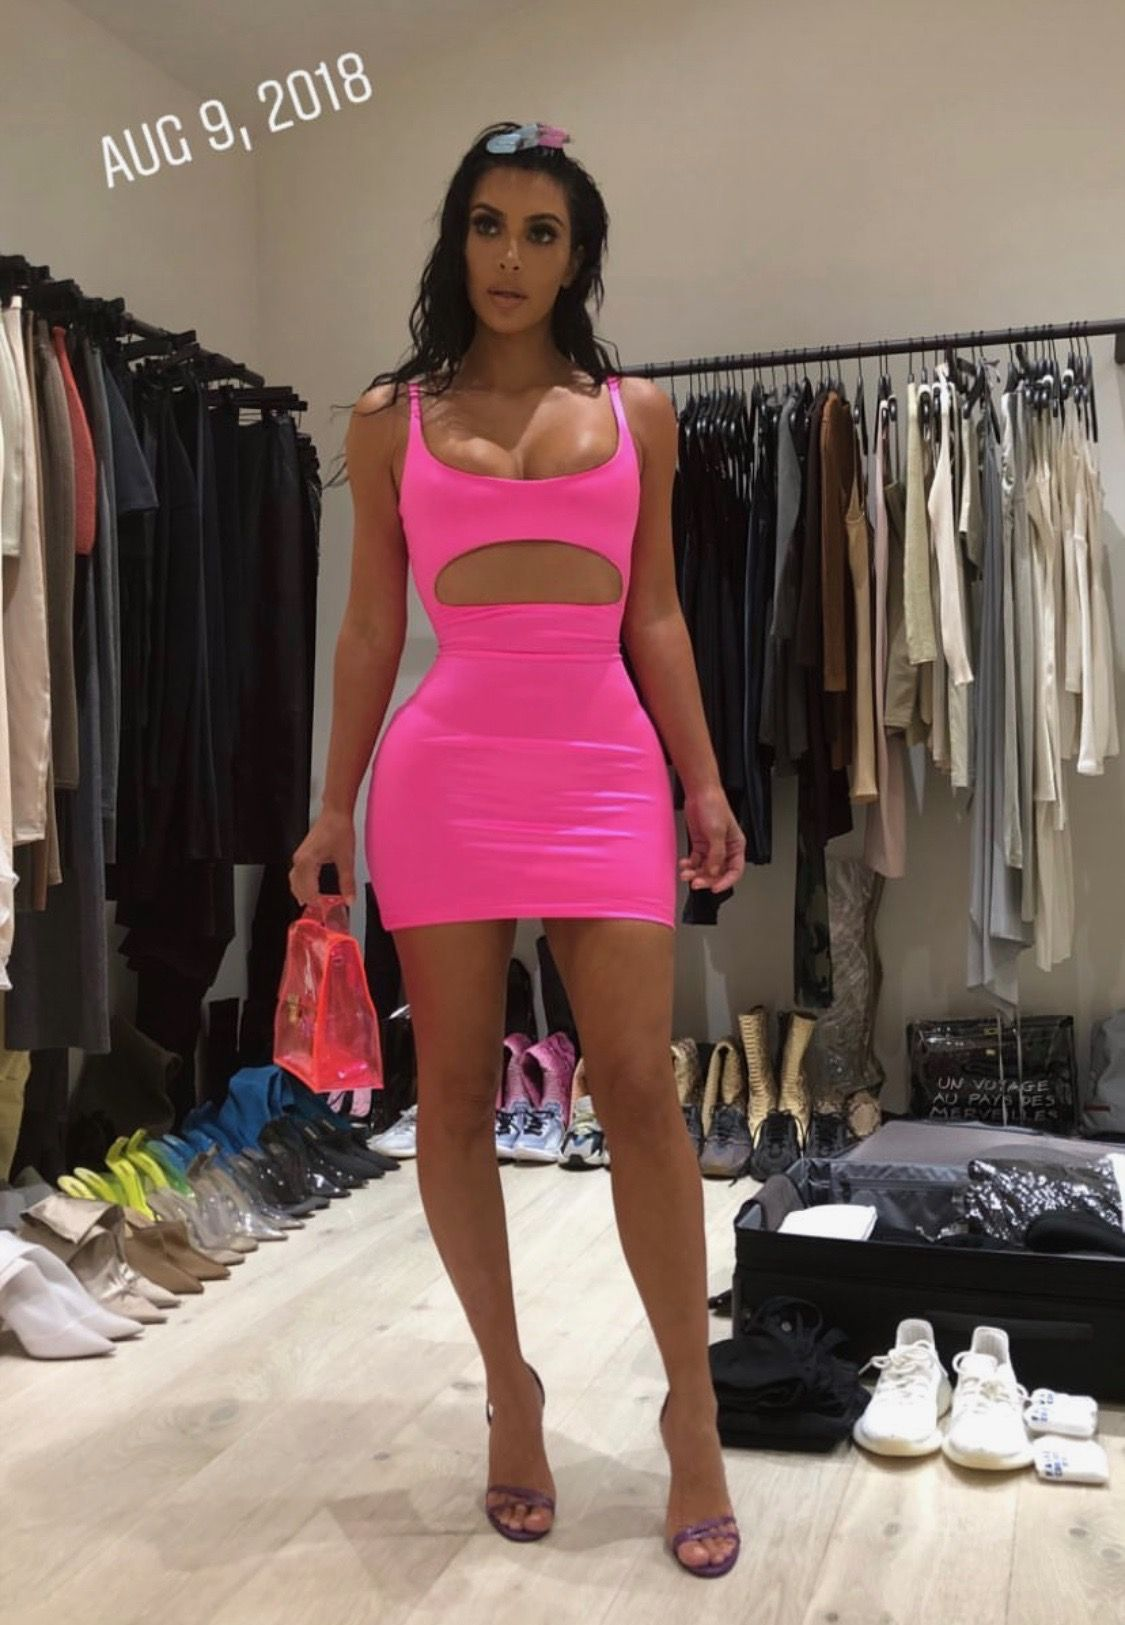 yeezy pink dress